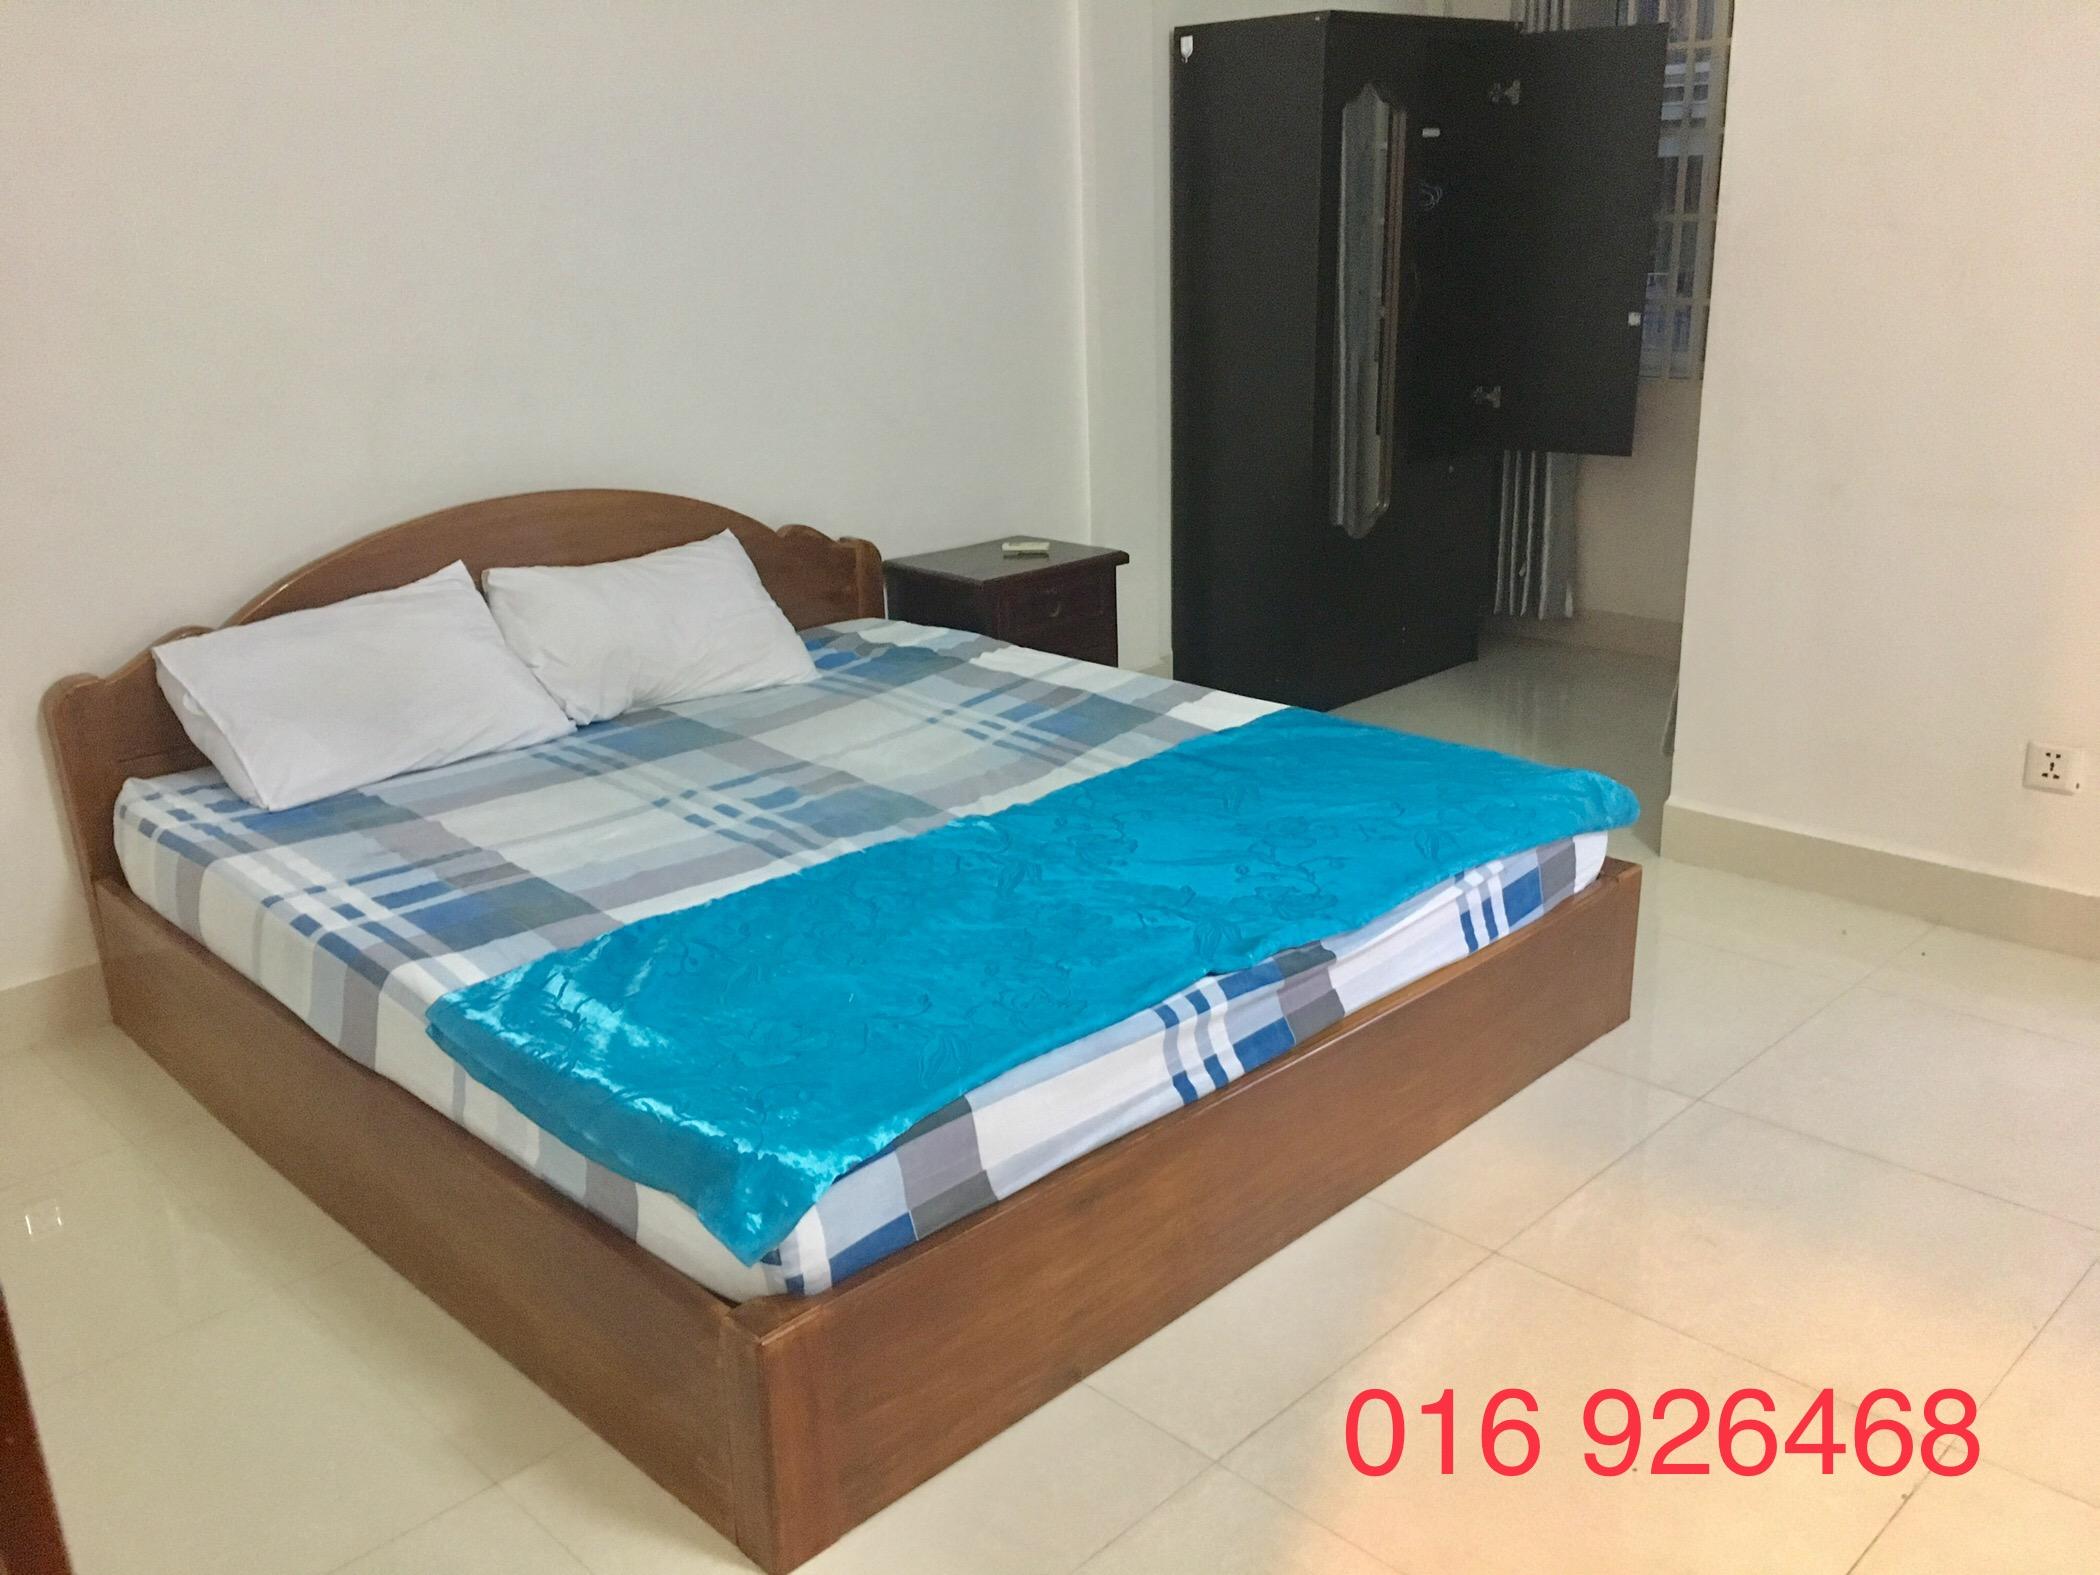 1 Bedroom $260 Beautiful Balcony Apartment Rental in Phnom Penh,BKK2